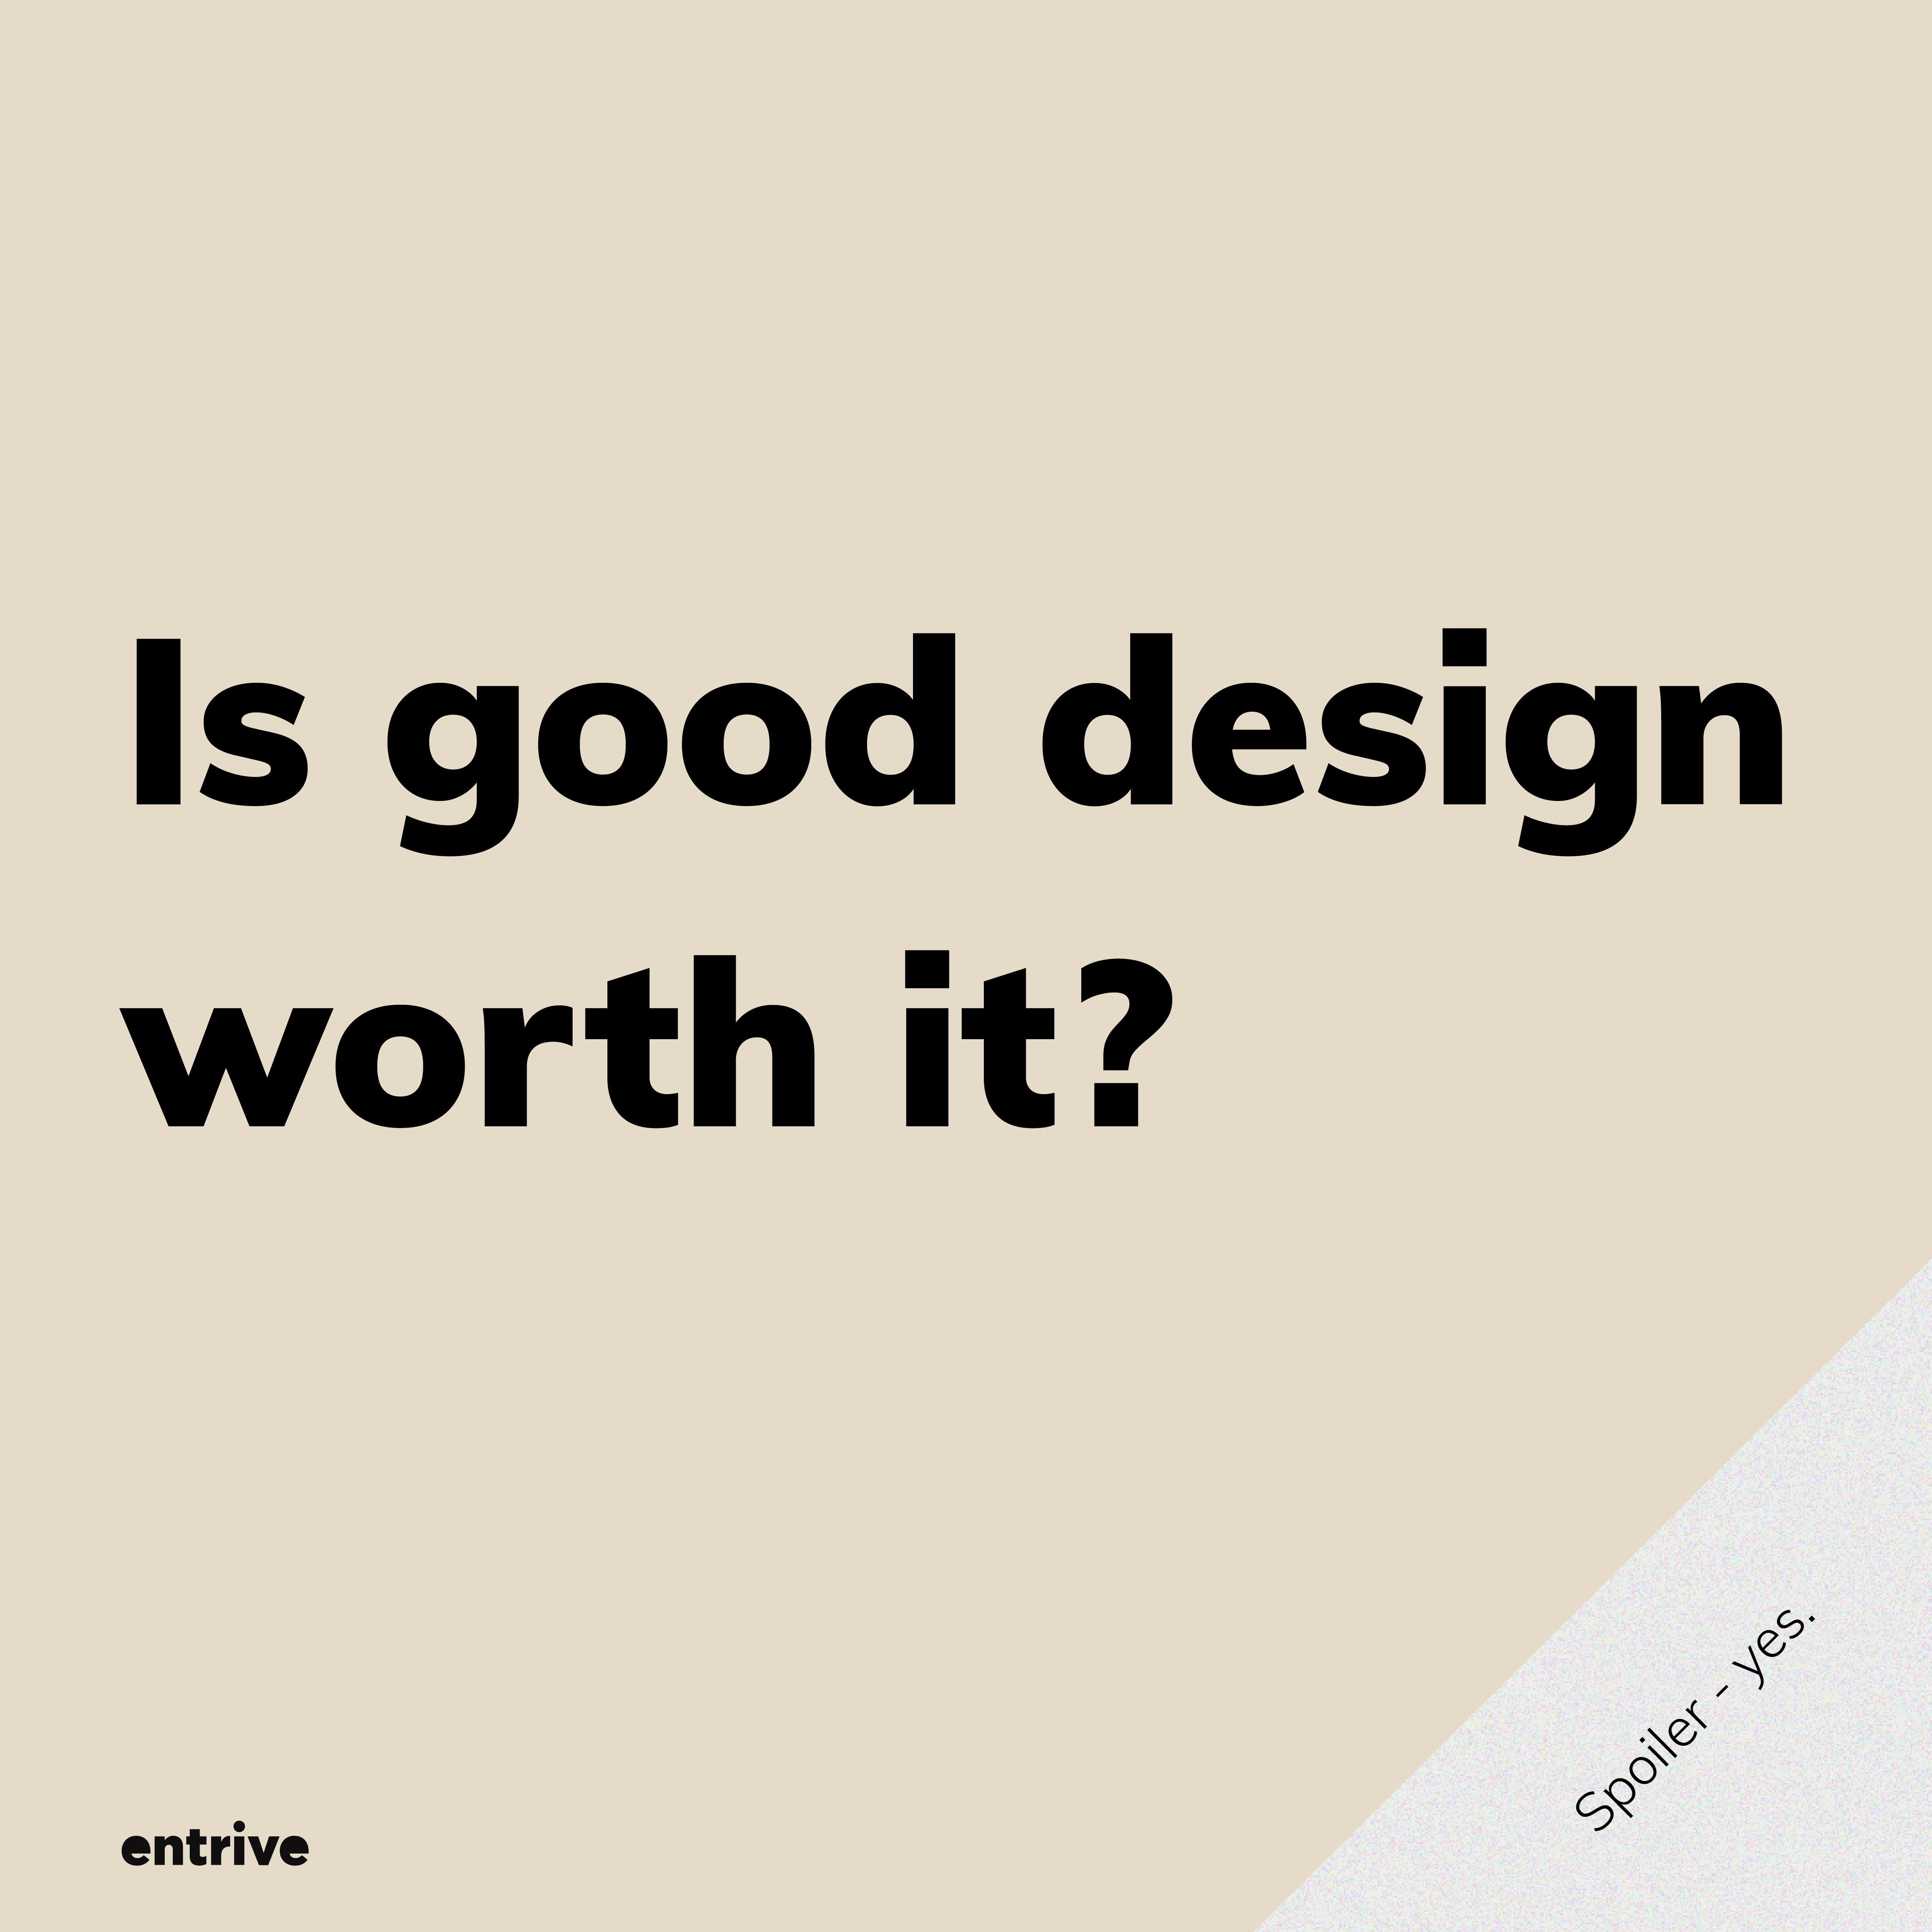 good design worth it